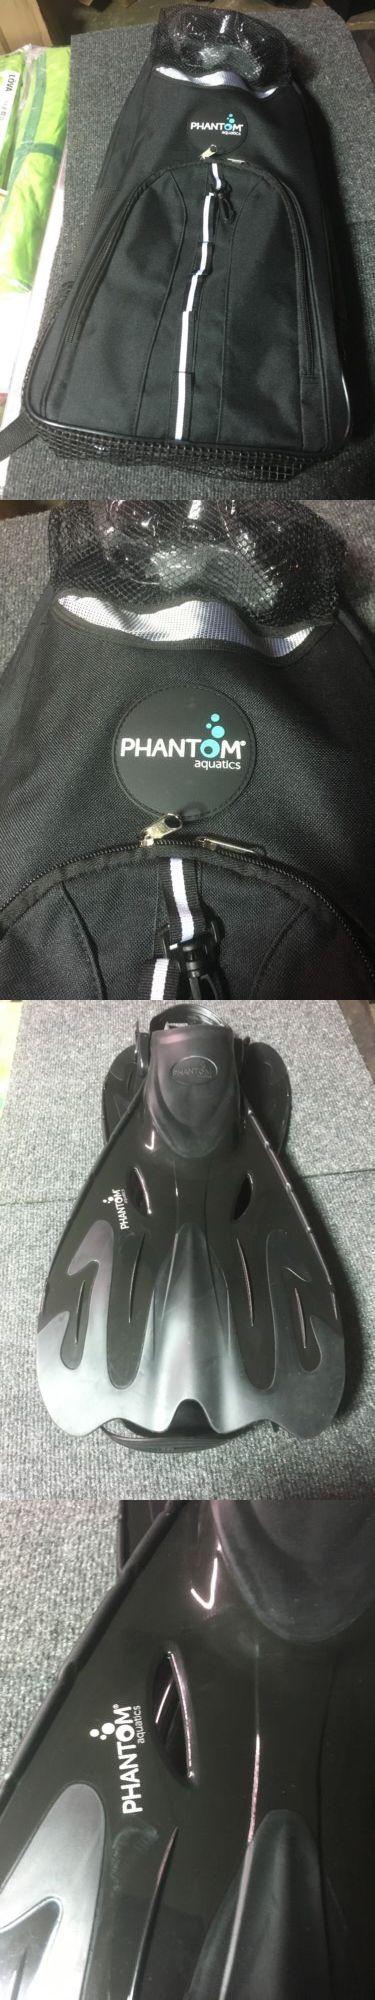 Snorkels and Sets 71162: Phantom Aquatics Legendary Mask Fin Snorkel Set With Bag, Black, Large -> BUY IT NOW ONLY: $49.99 on eBay!